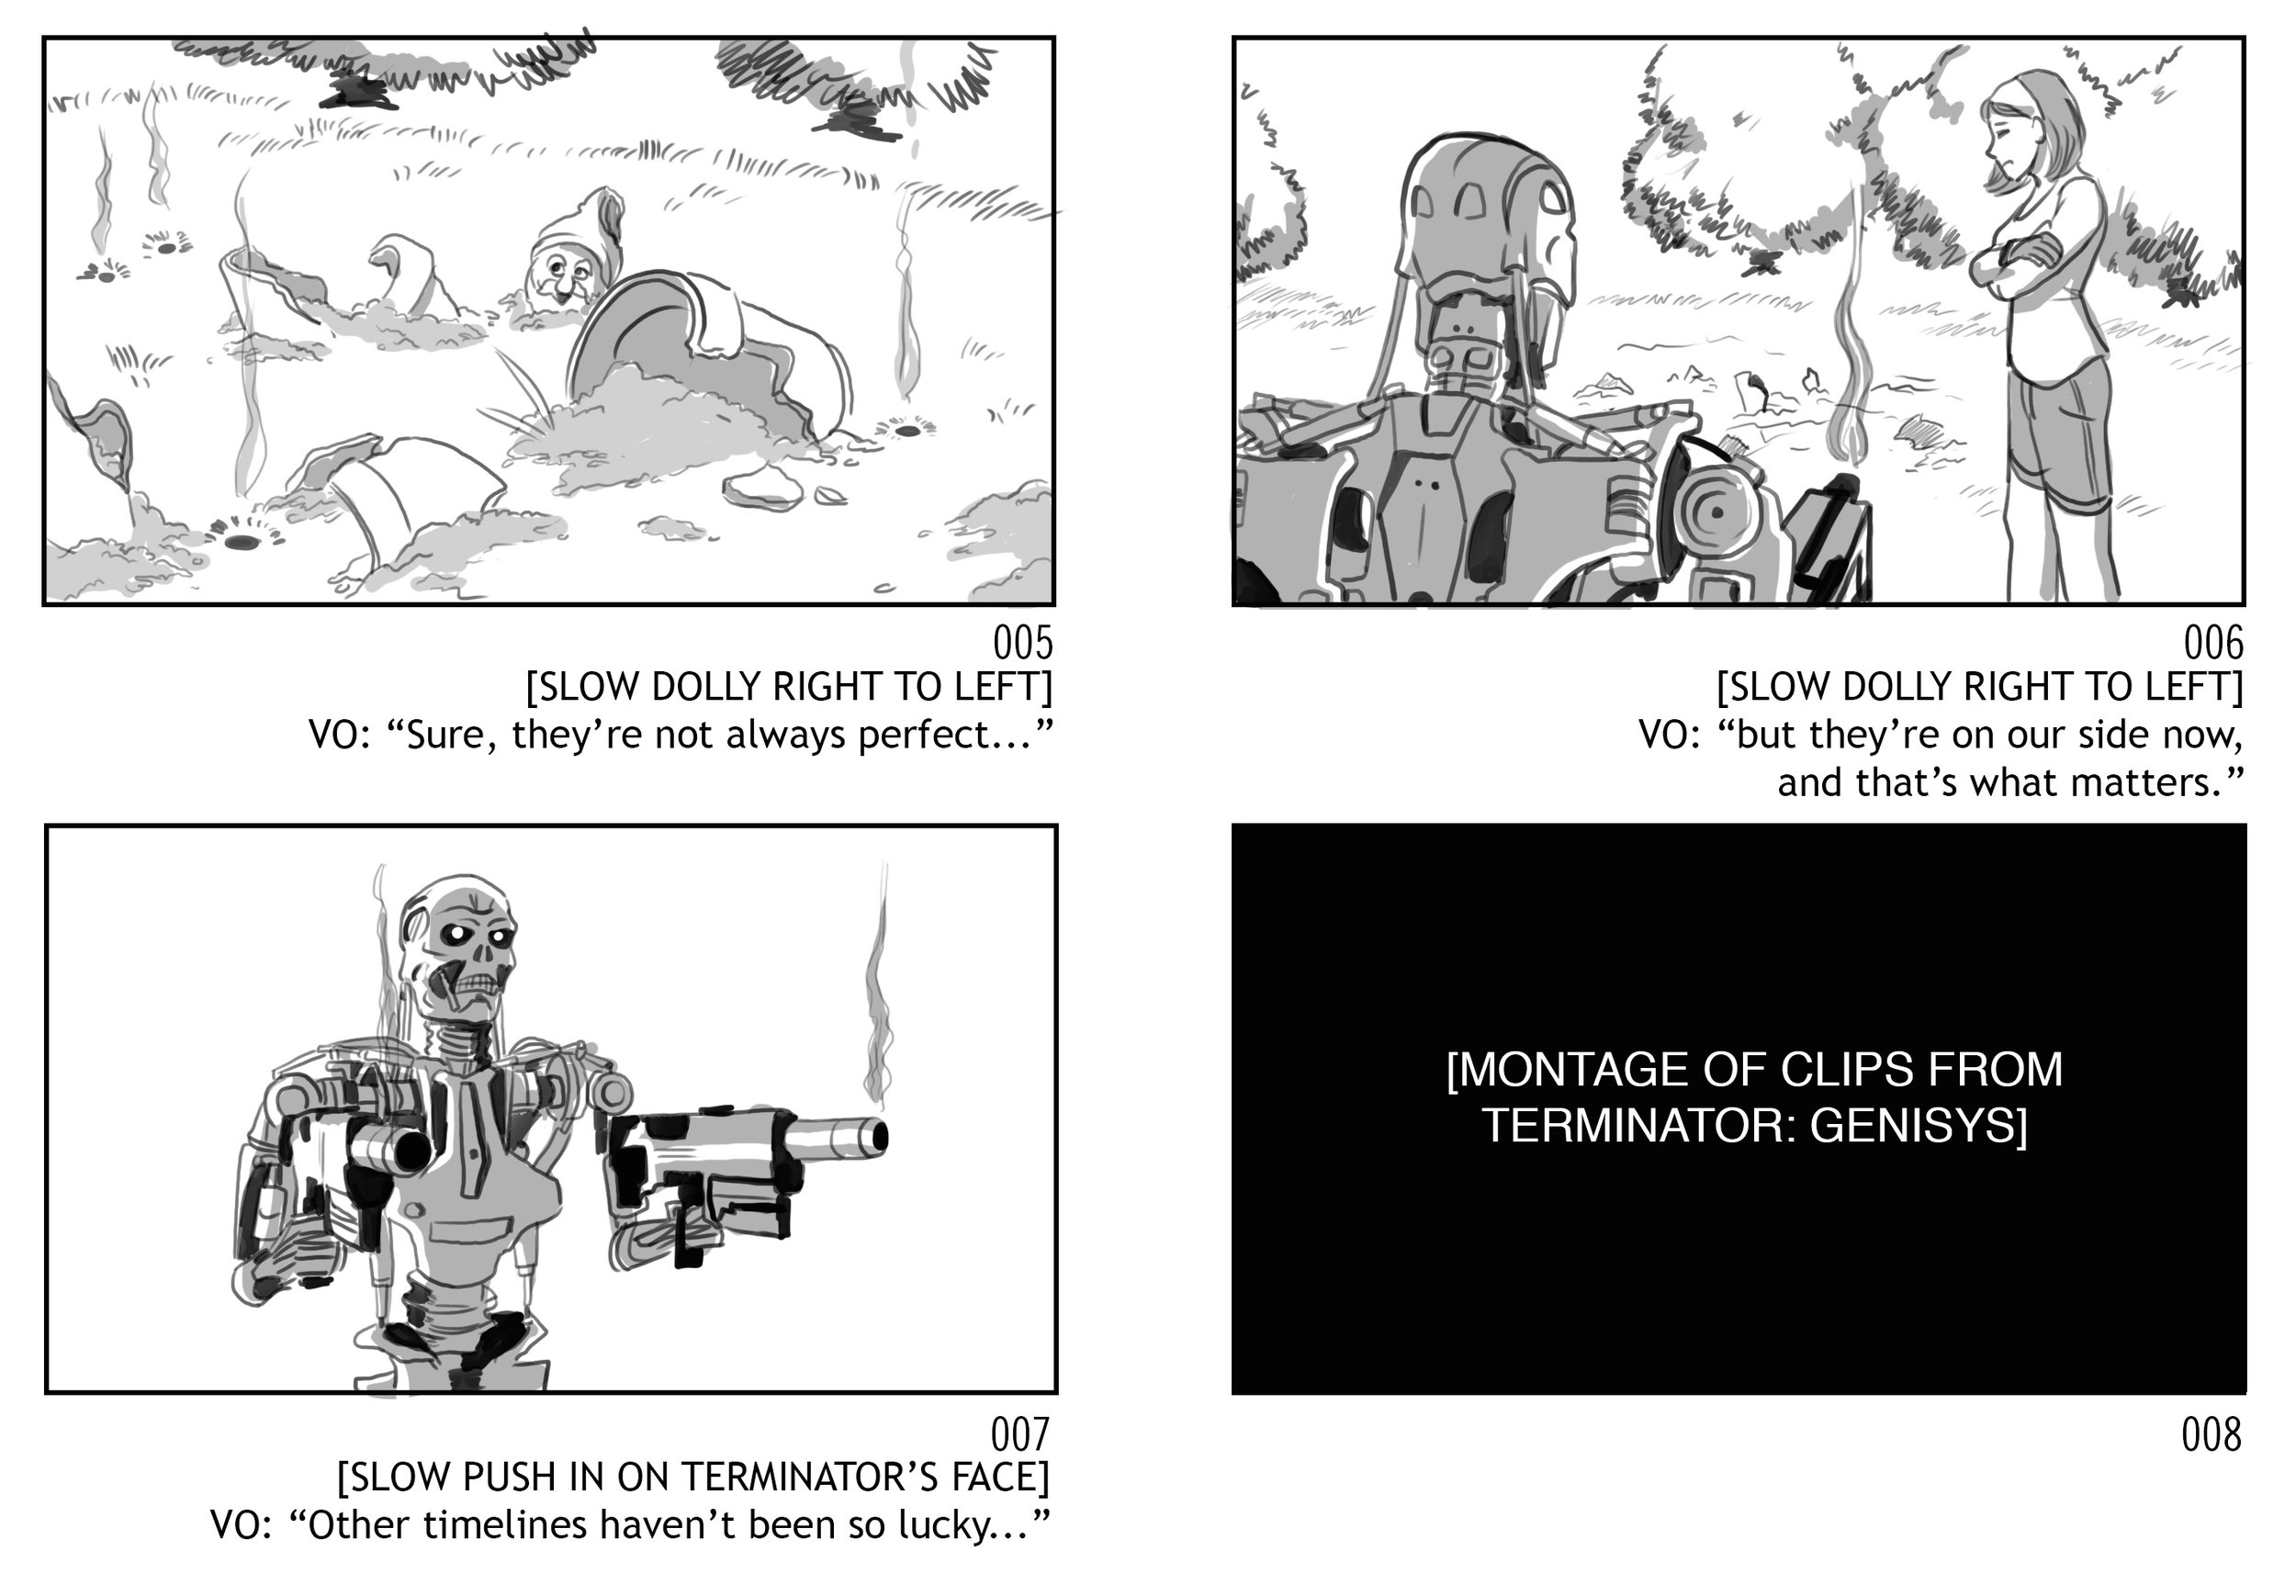 Terminator002.jpg